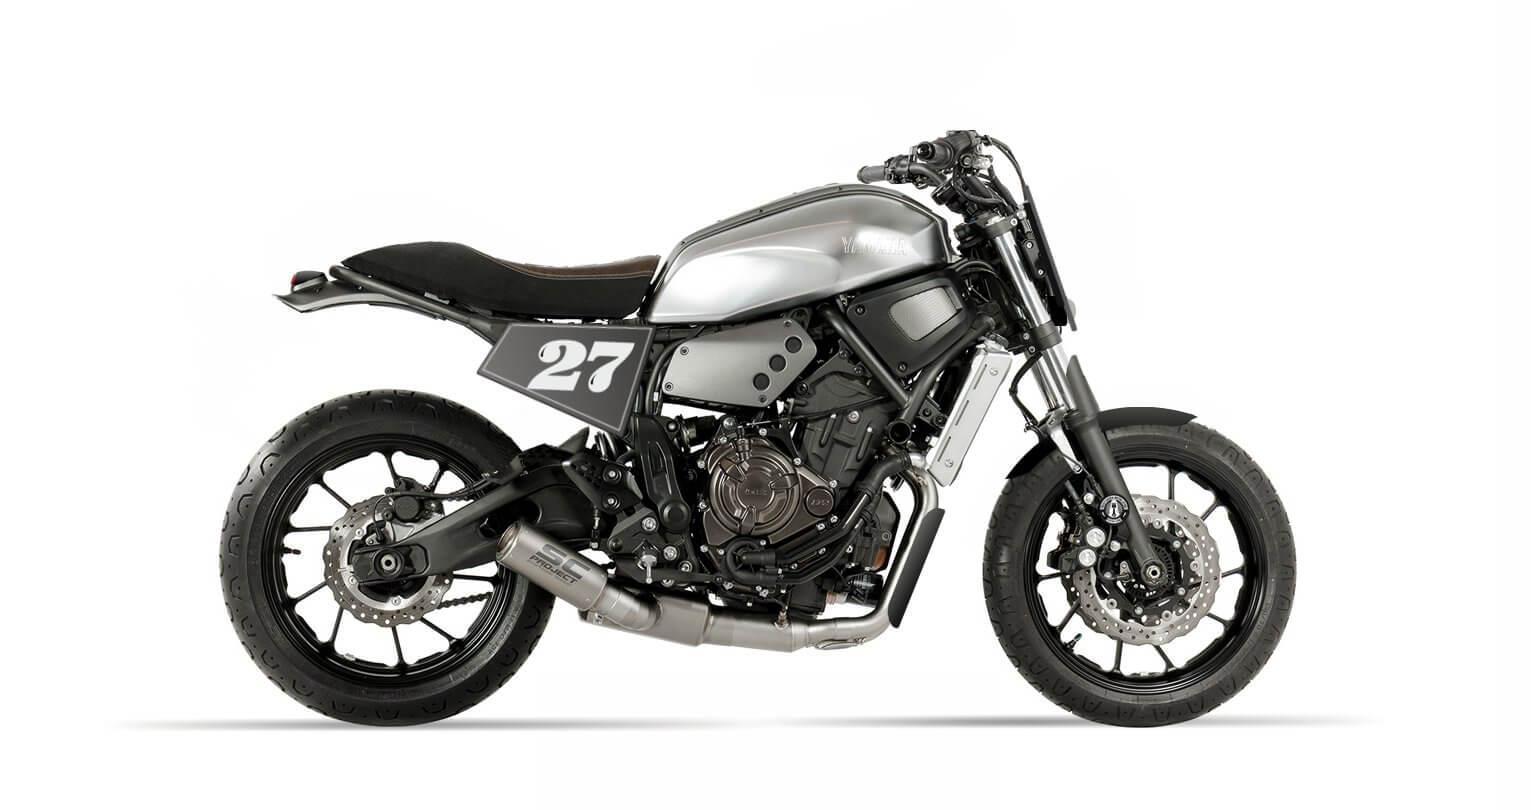 Yamaha-XSR700-silver-tracker-caferacer-daniel-schuh-espiat